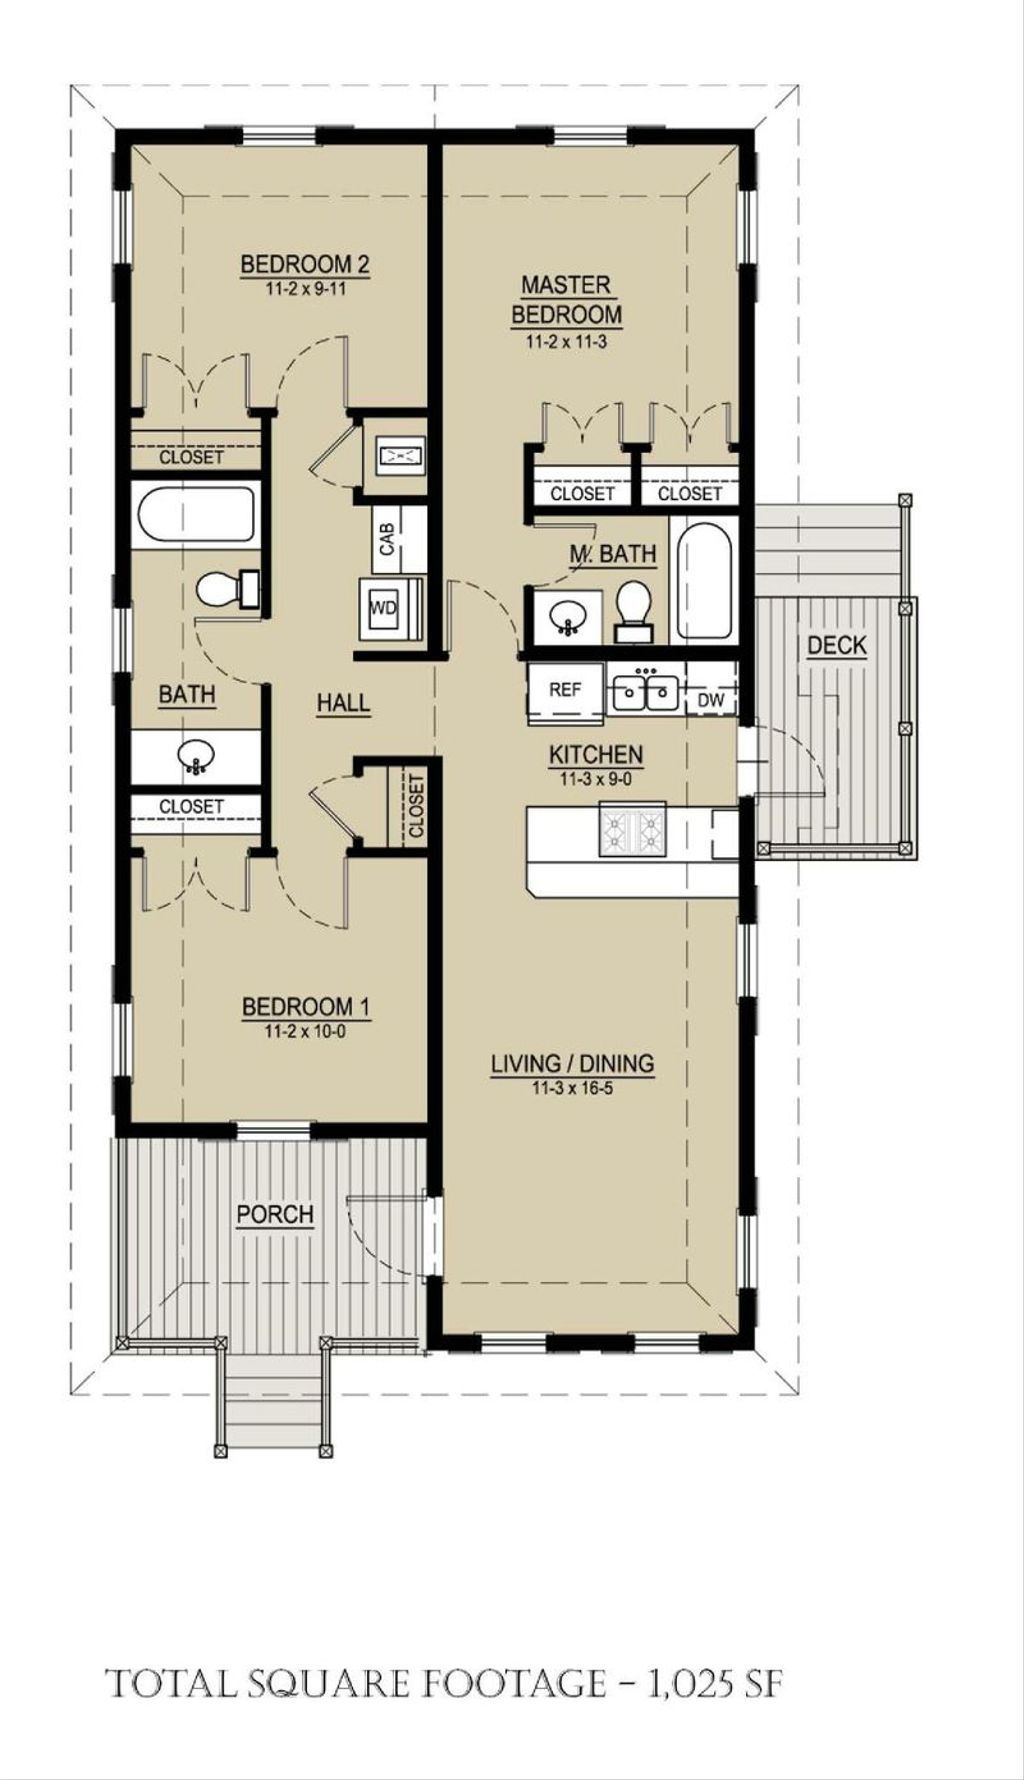 cottage style house plan 3 beds 2 baths 1025 sq ft plan 536 3 rh houseplans com ground floor house plans 1000 sq ft guest house floor plans 1000 sq ft